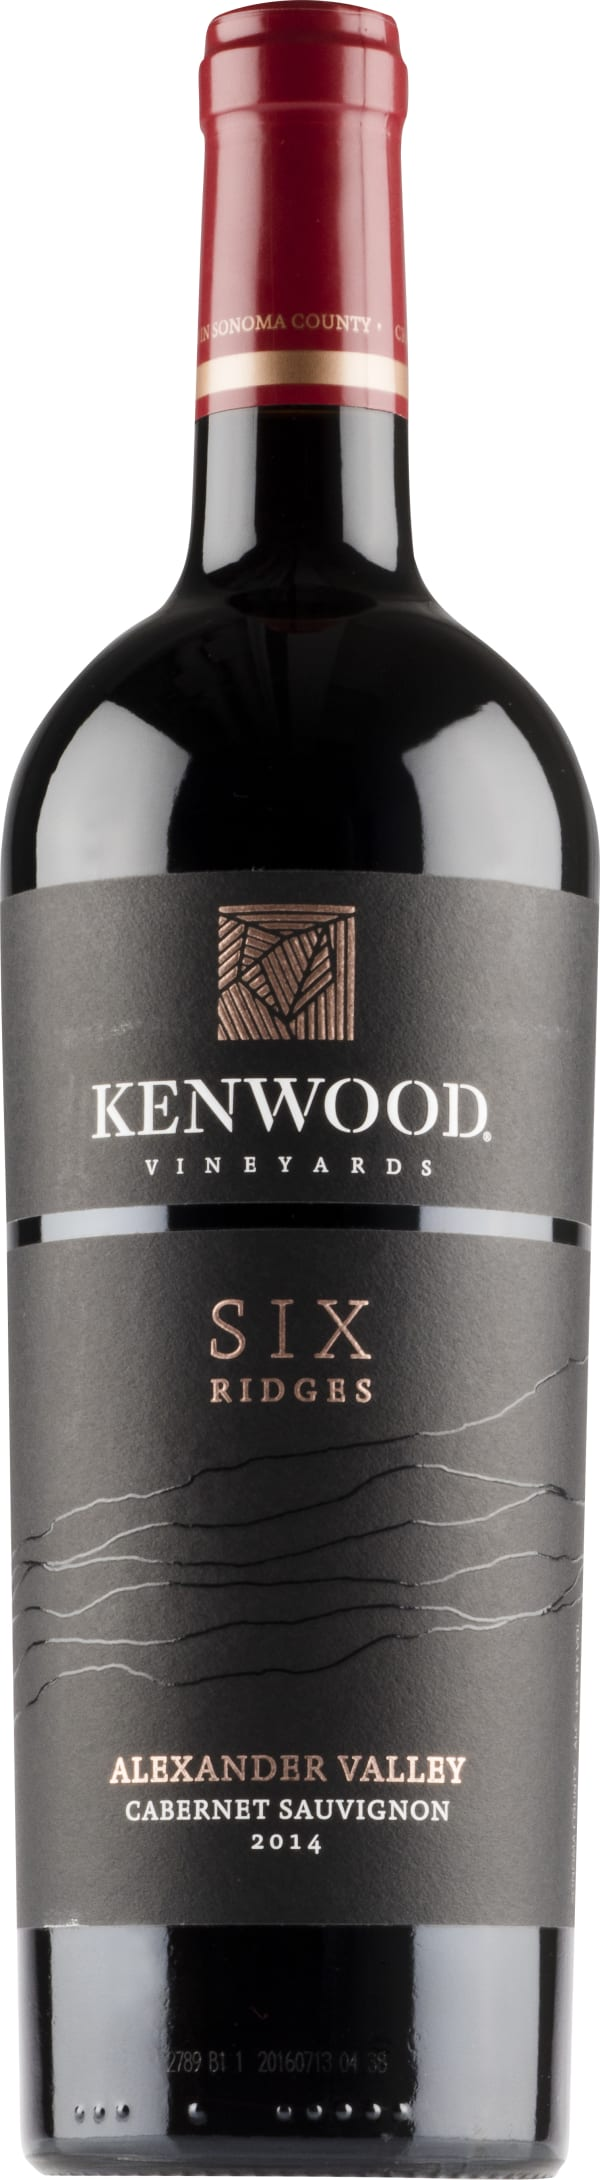 Kenwood Six Ridges Cabernet Sauvignon 2014